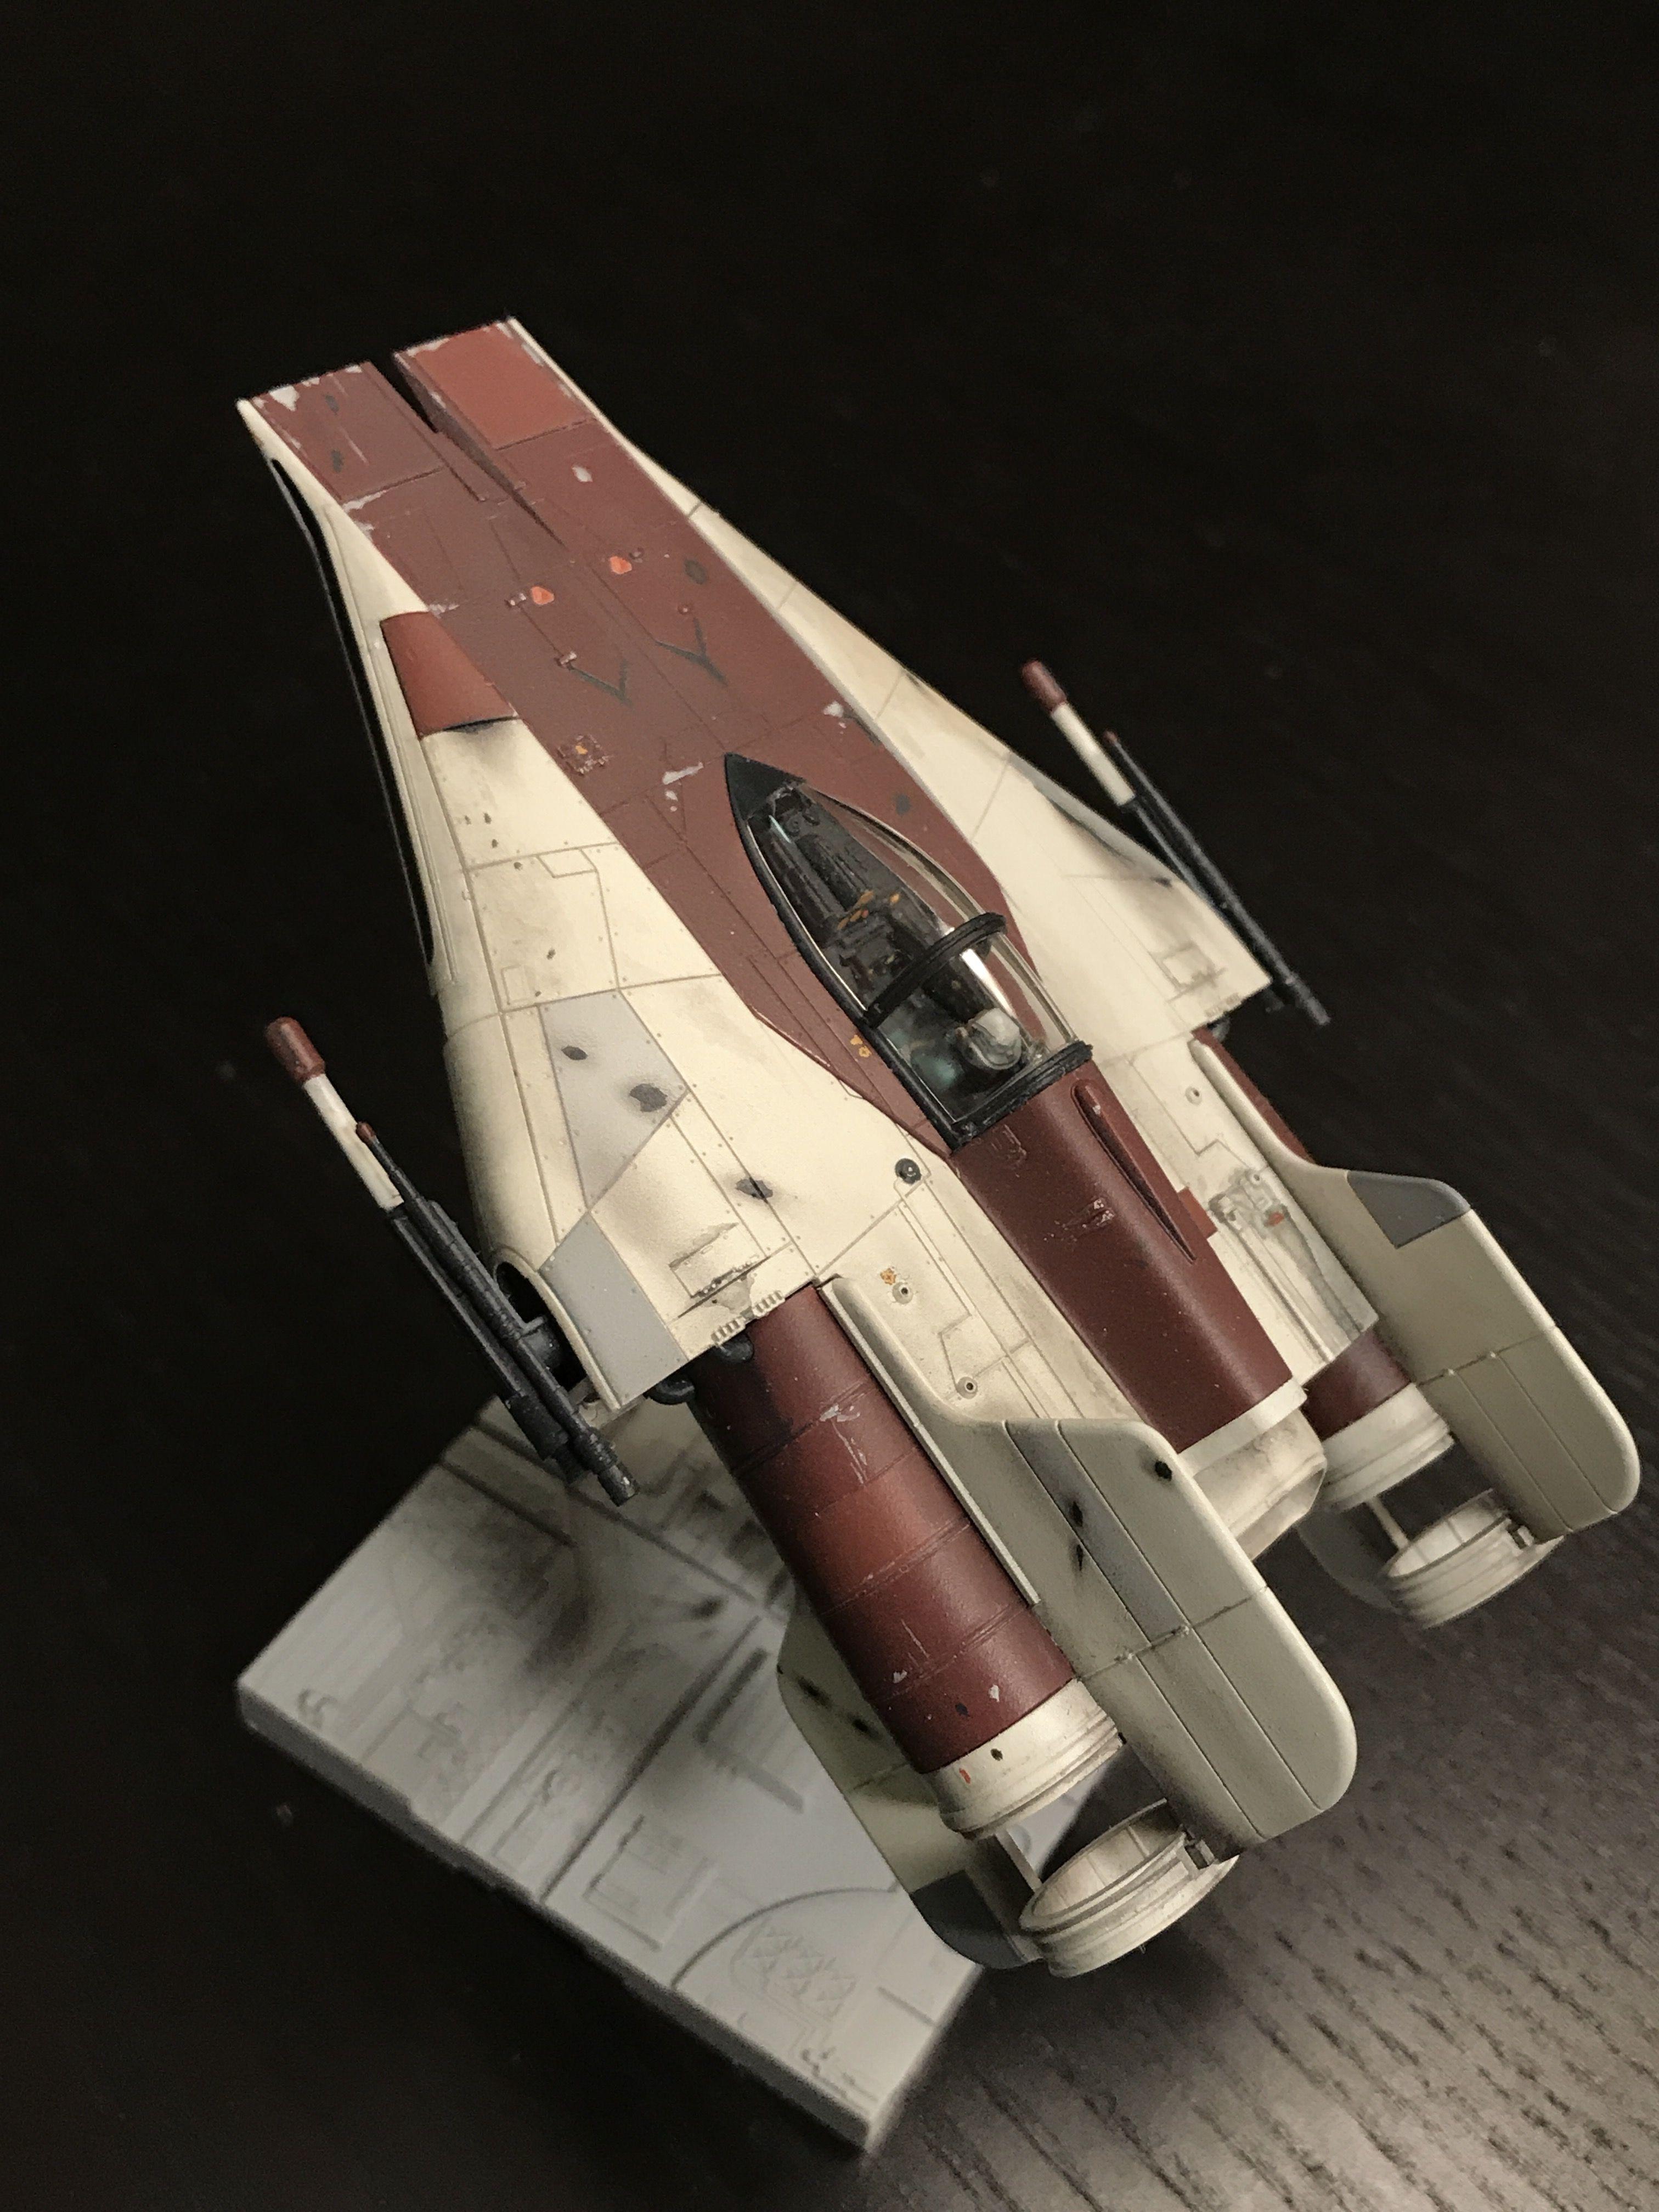 Star Wars BANDAI A-Wing Starfighter 1:144 Plastic Model Kit 010 UK Posted